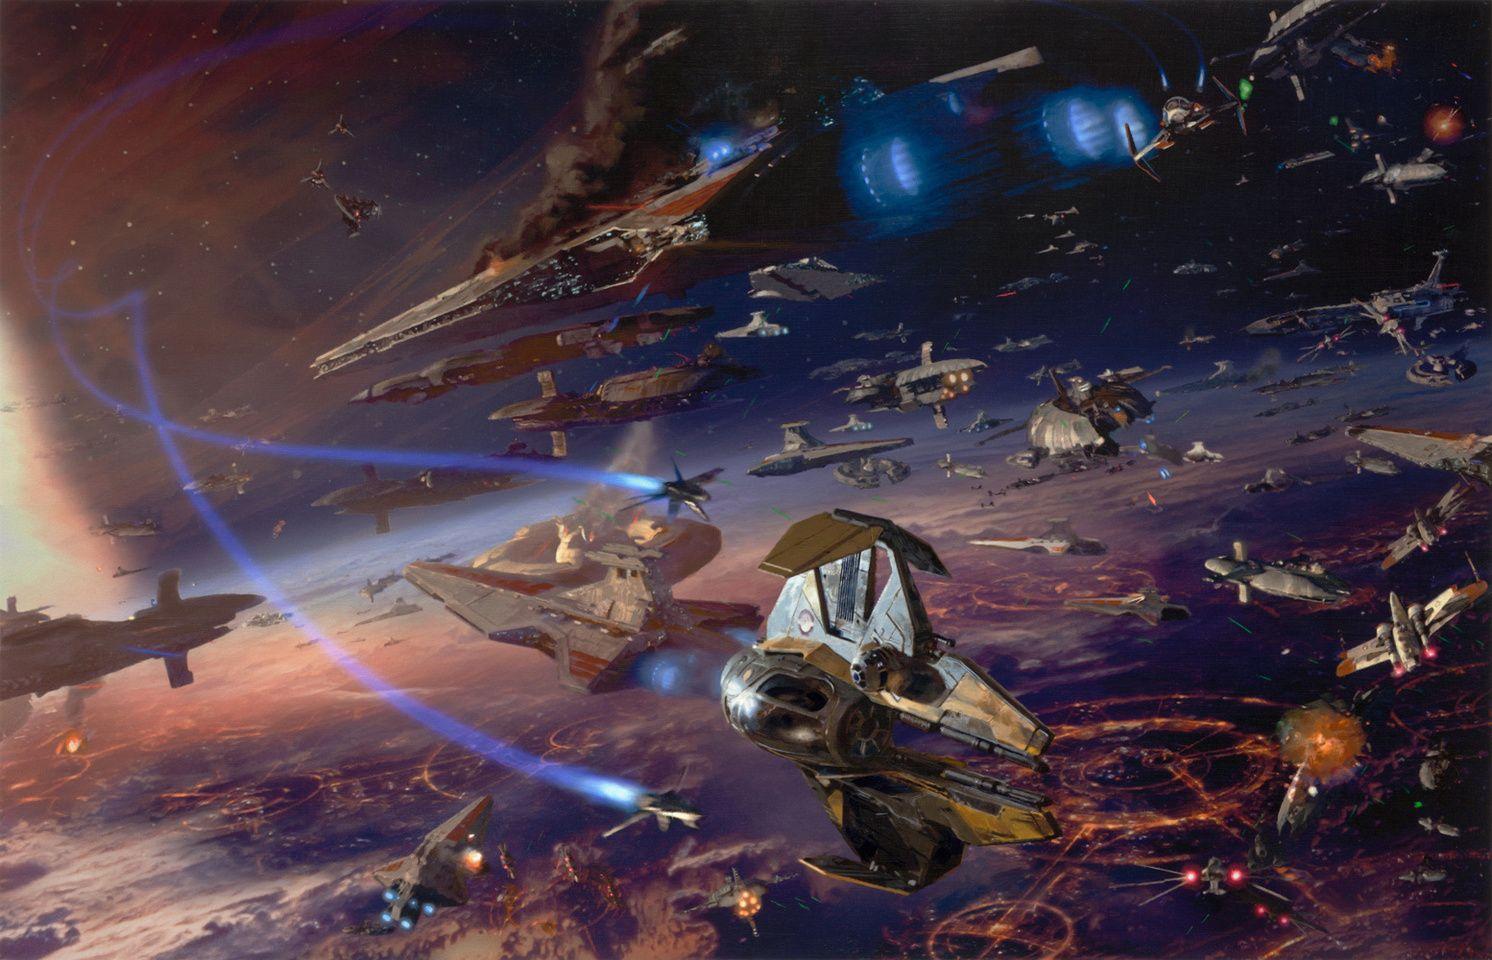 Star Wars Battle Of Coruscant Del Rey Books Lucasfilm Dave Seeley Star Wars Ships Star Wars Clone Wars Star Wars Poster